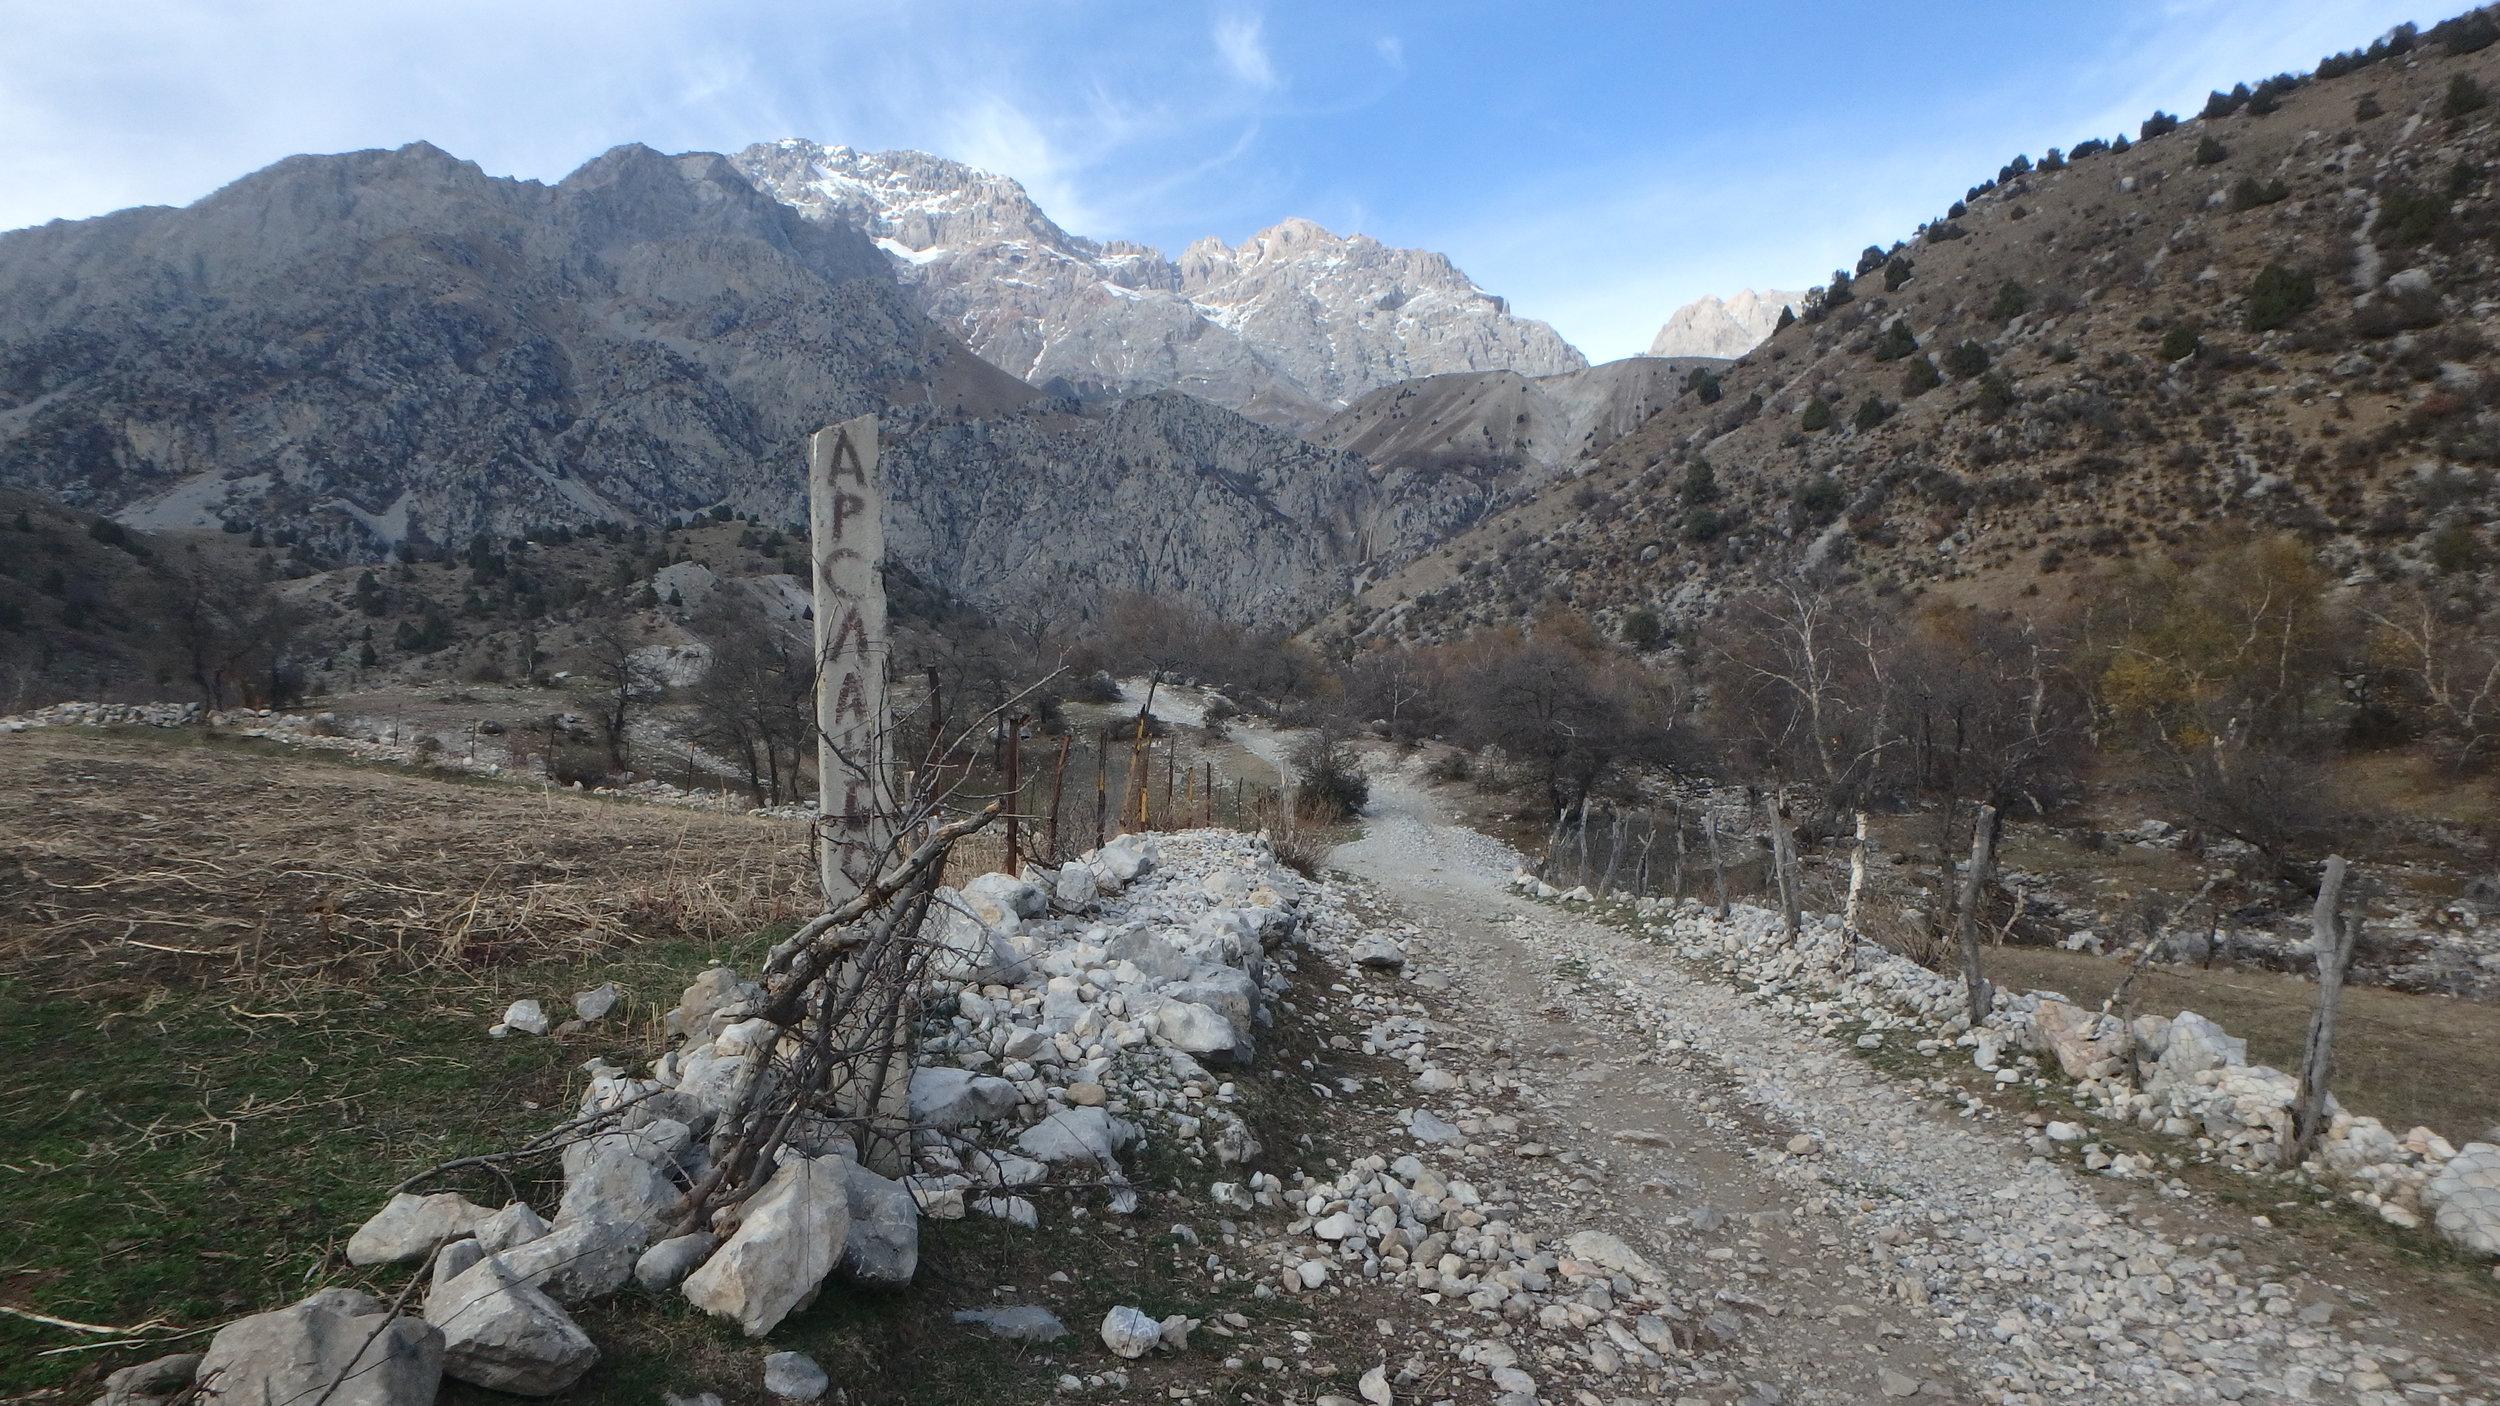 Mountain roads.